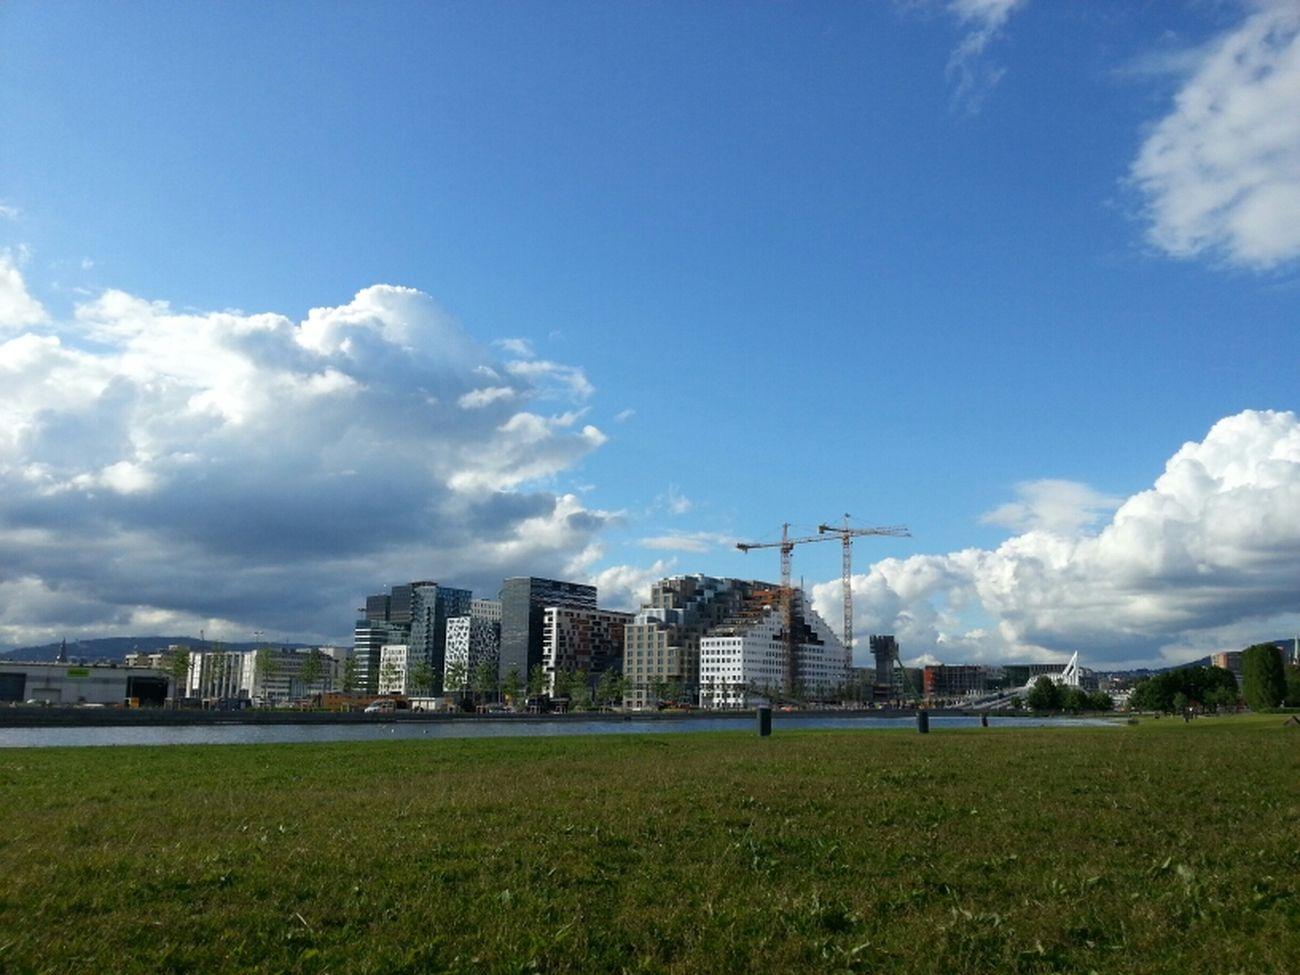 tarda ventosa, però relaxada / windy but peaceful afternoon / blåsende men rolige kveld #oslo #norway